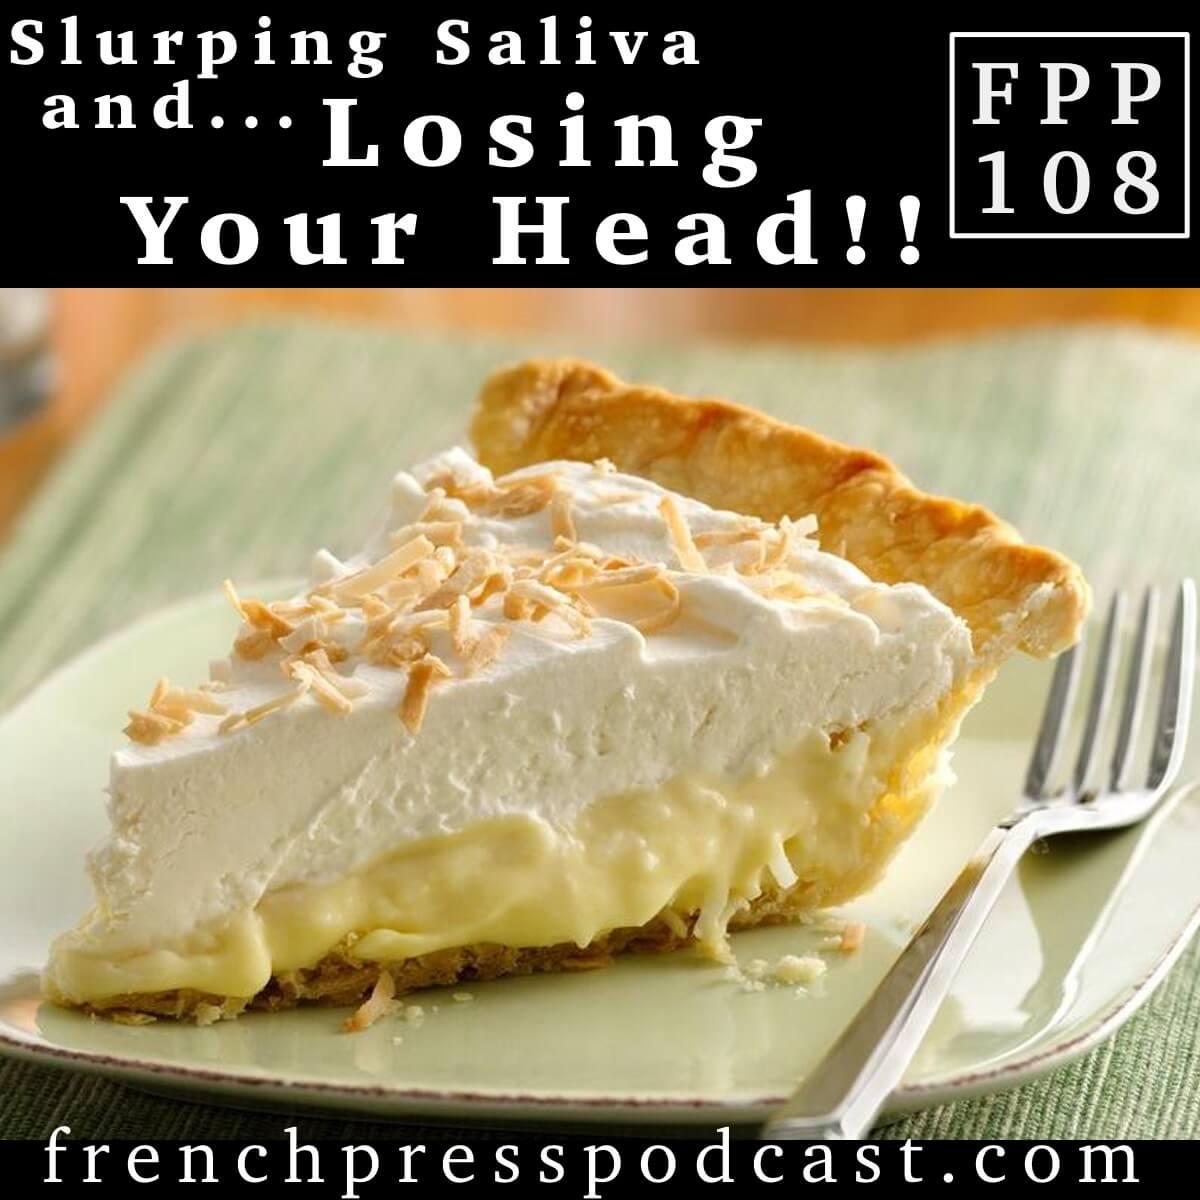 Slurping Saliva and Losing Your Head FPP108